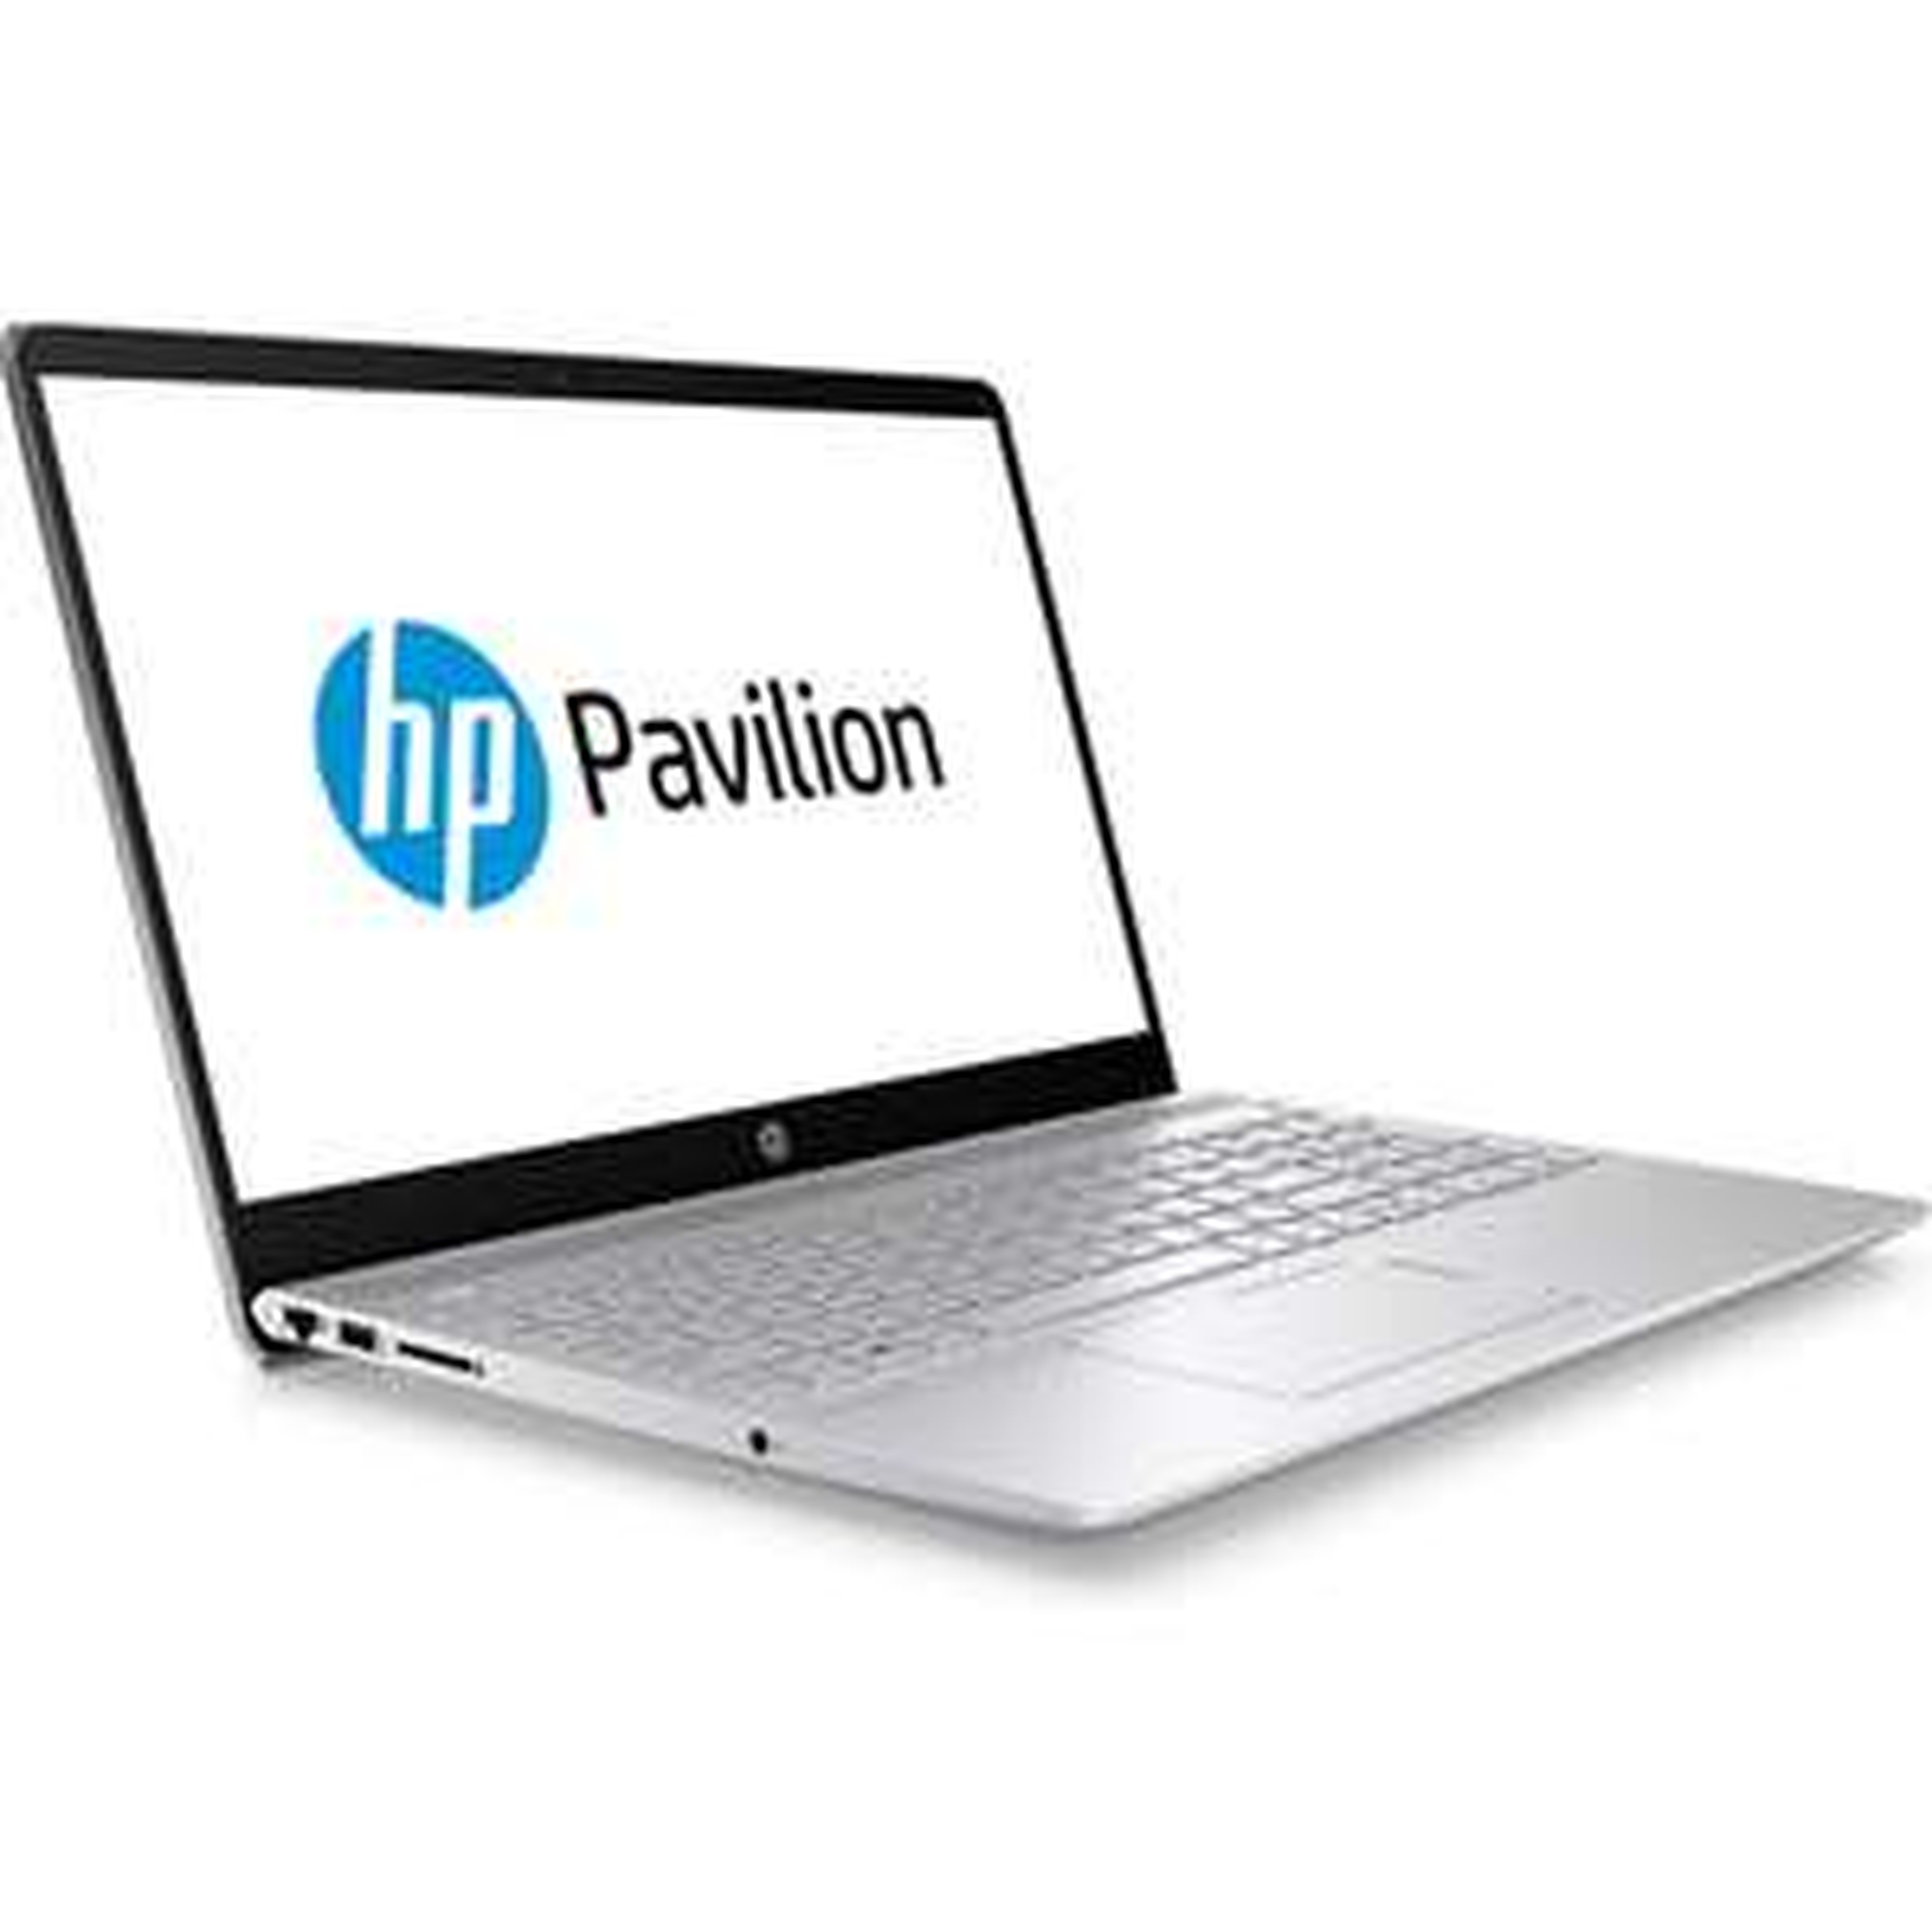 [B4F] HP Pavilion 15-ck002ng - Intel Core i7-8550U (8GB/1TB+256SSD/W10H), beleuchtete Tastatur, Alu Gehäuse, Slim Bezel, B&O Play